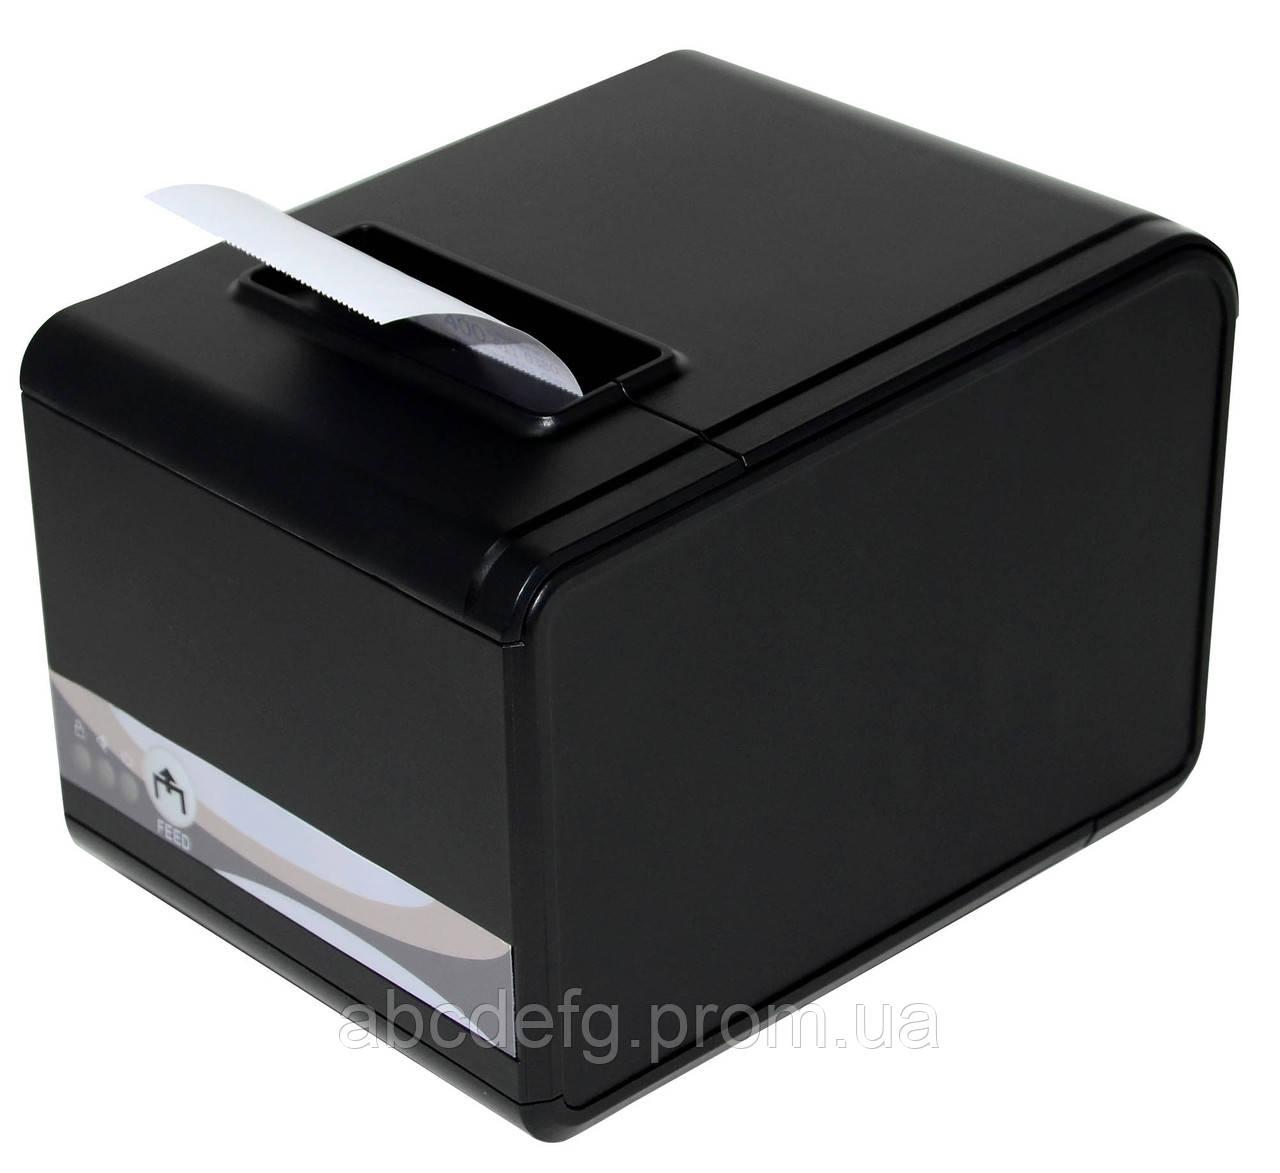 Принтер чеков Gprinter GP-L80250I